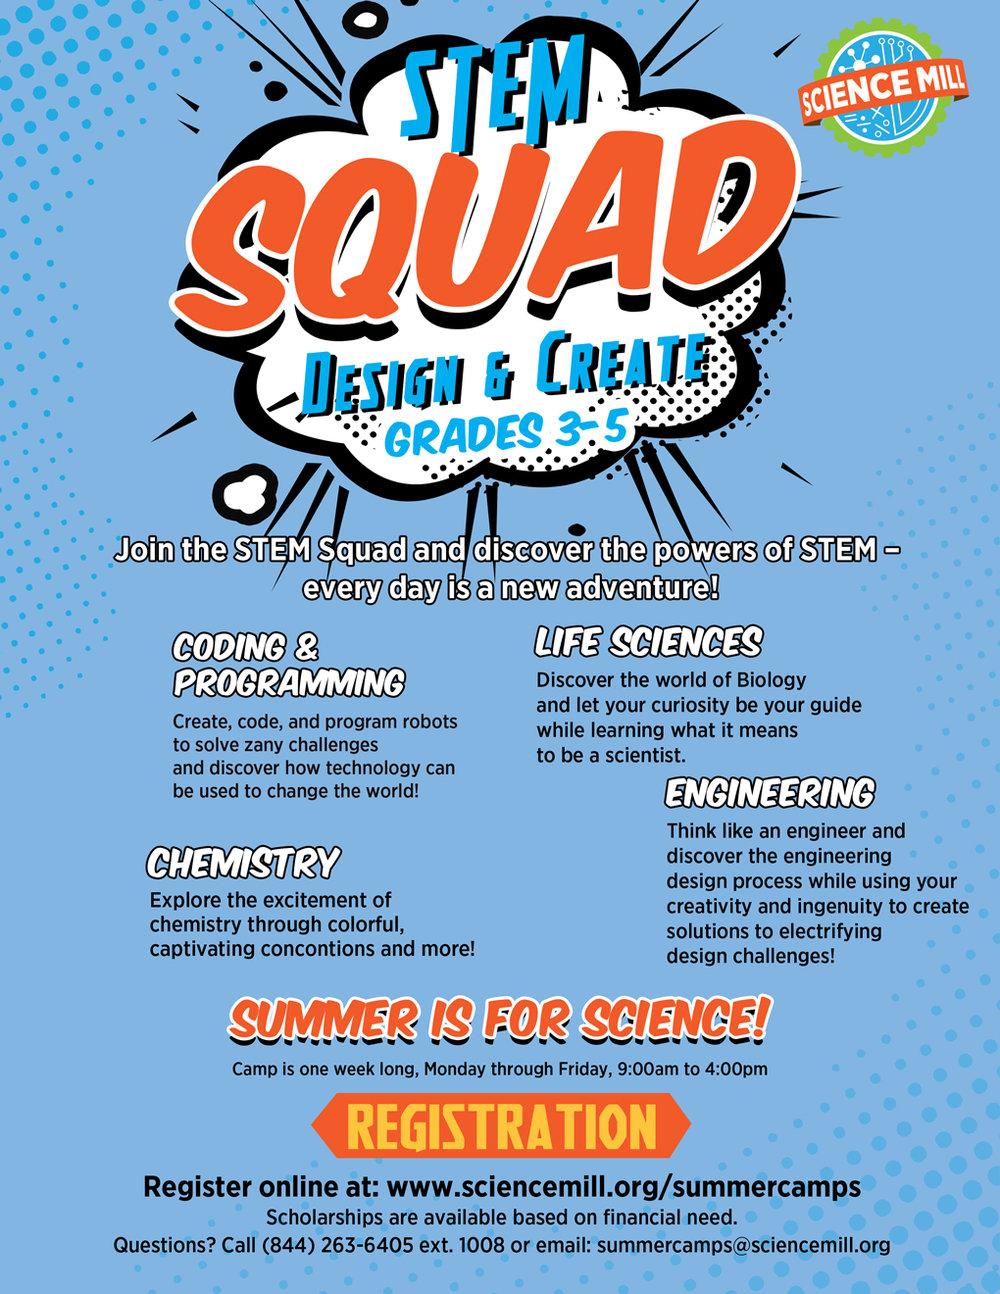 Squad_Flyer_3-5_web.jpg